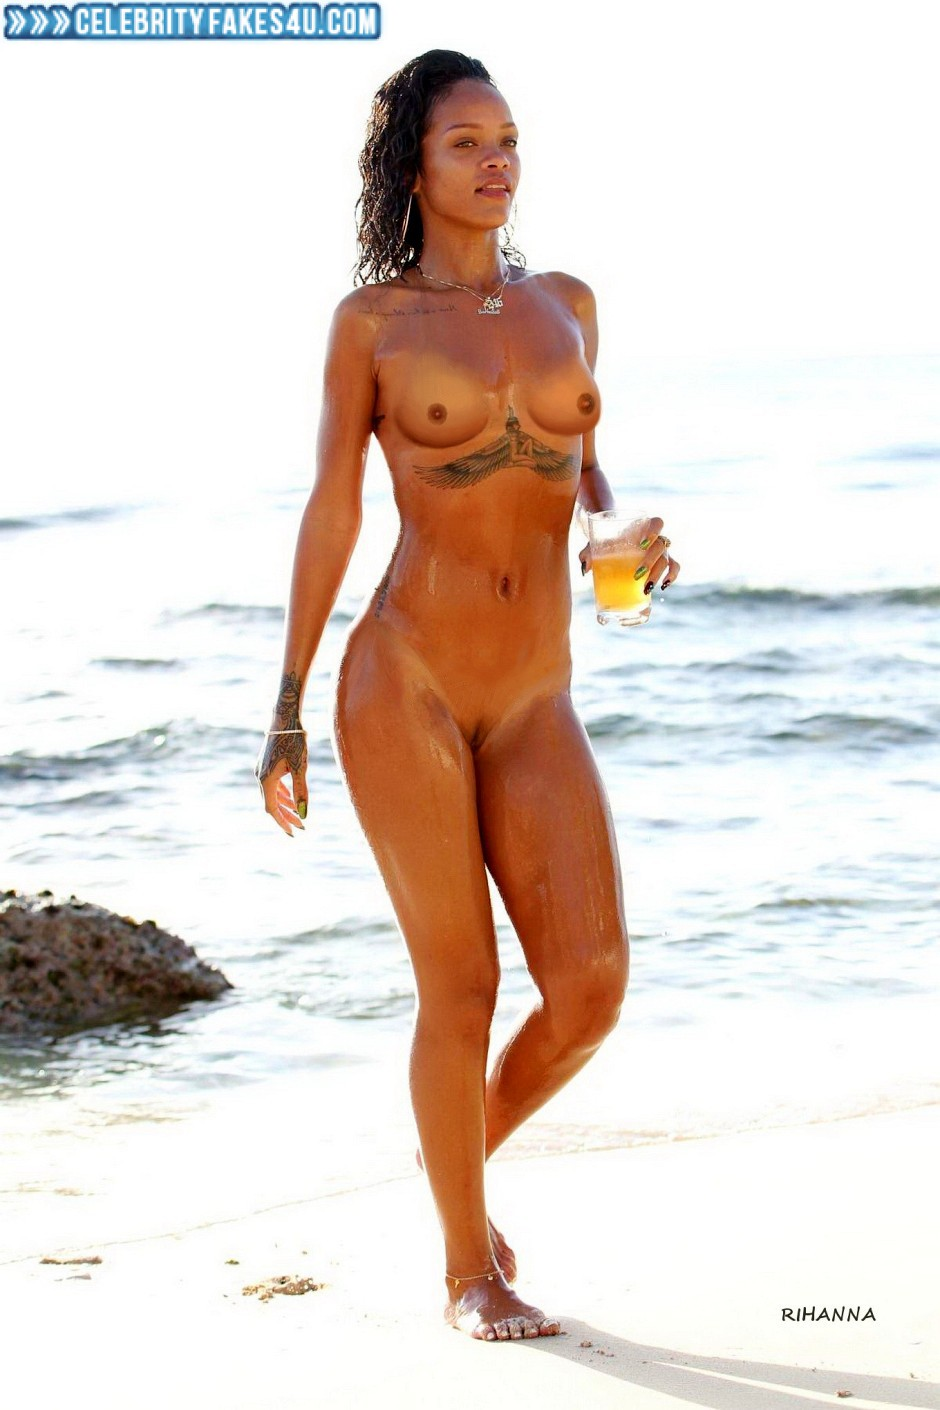 Rihanna Beach Camel Toe Naked Fake 001  Celebrity Fakes 4U-2176